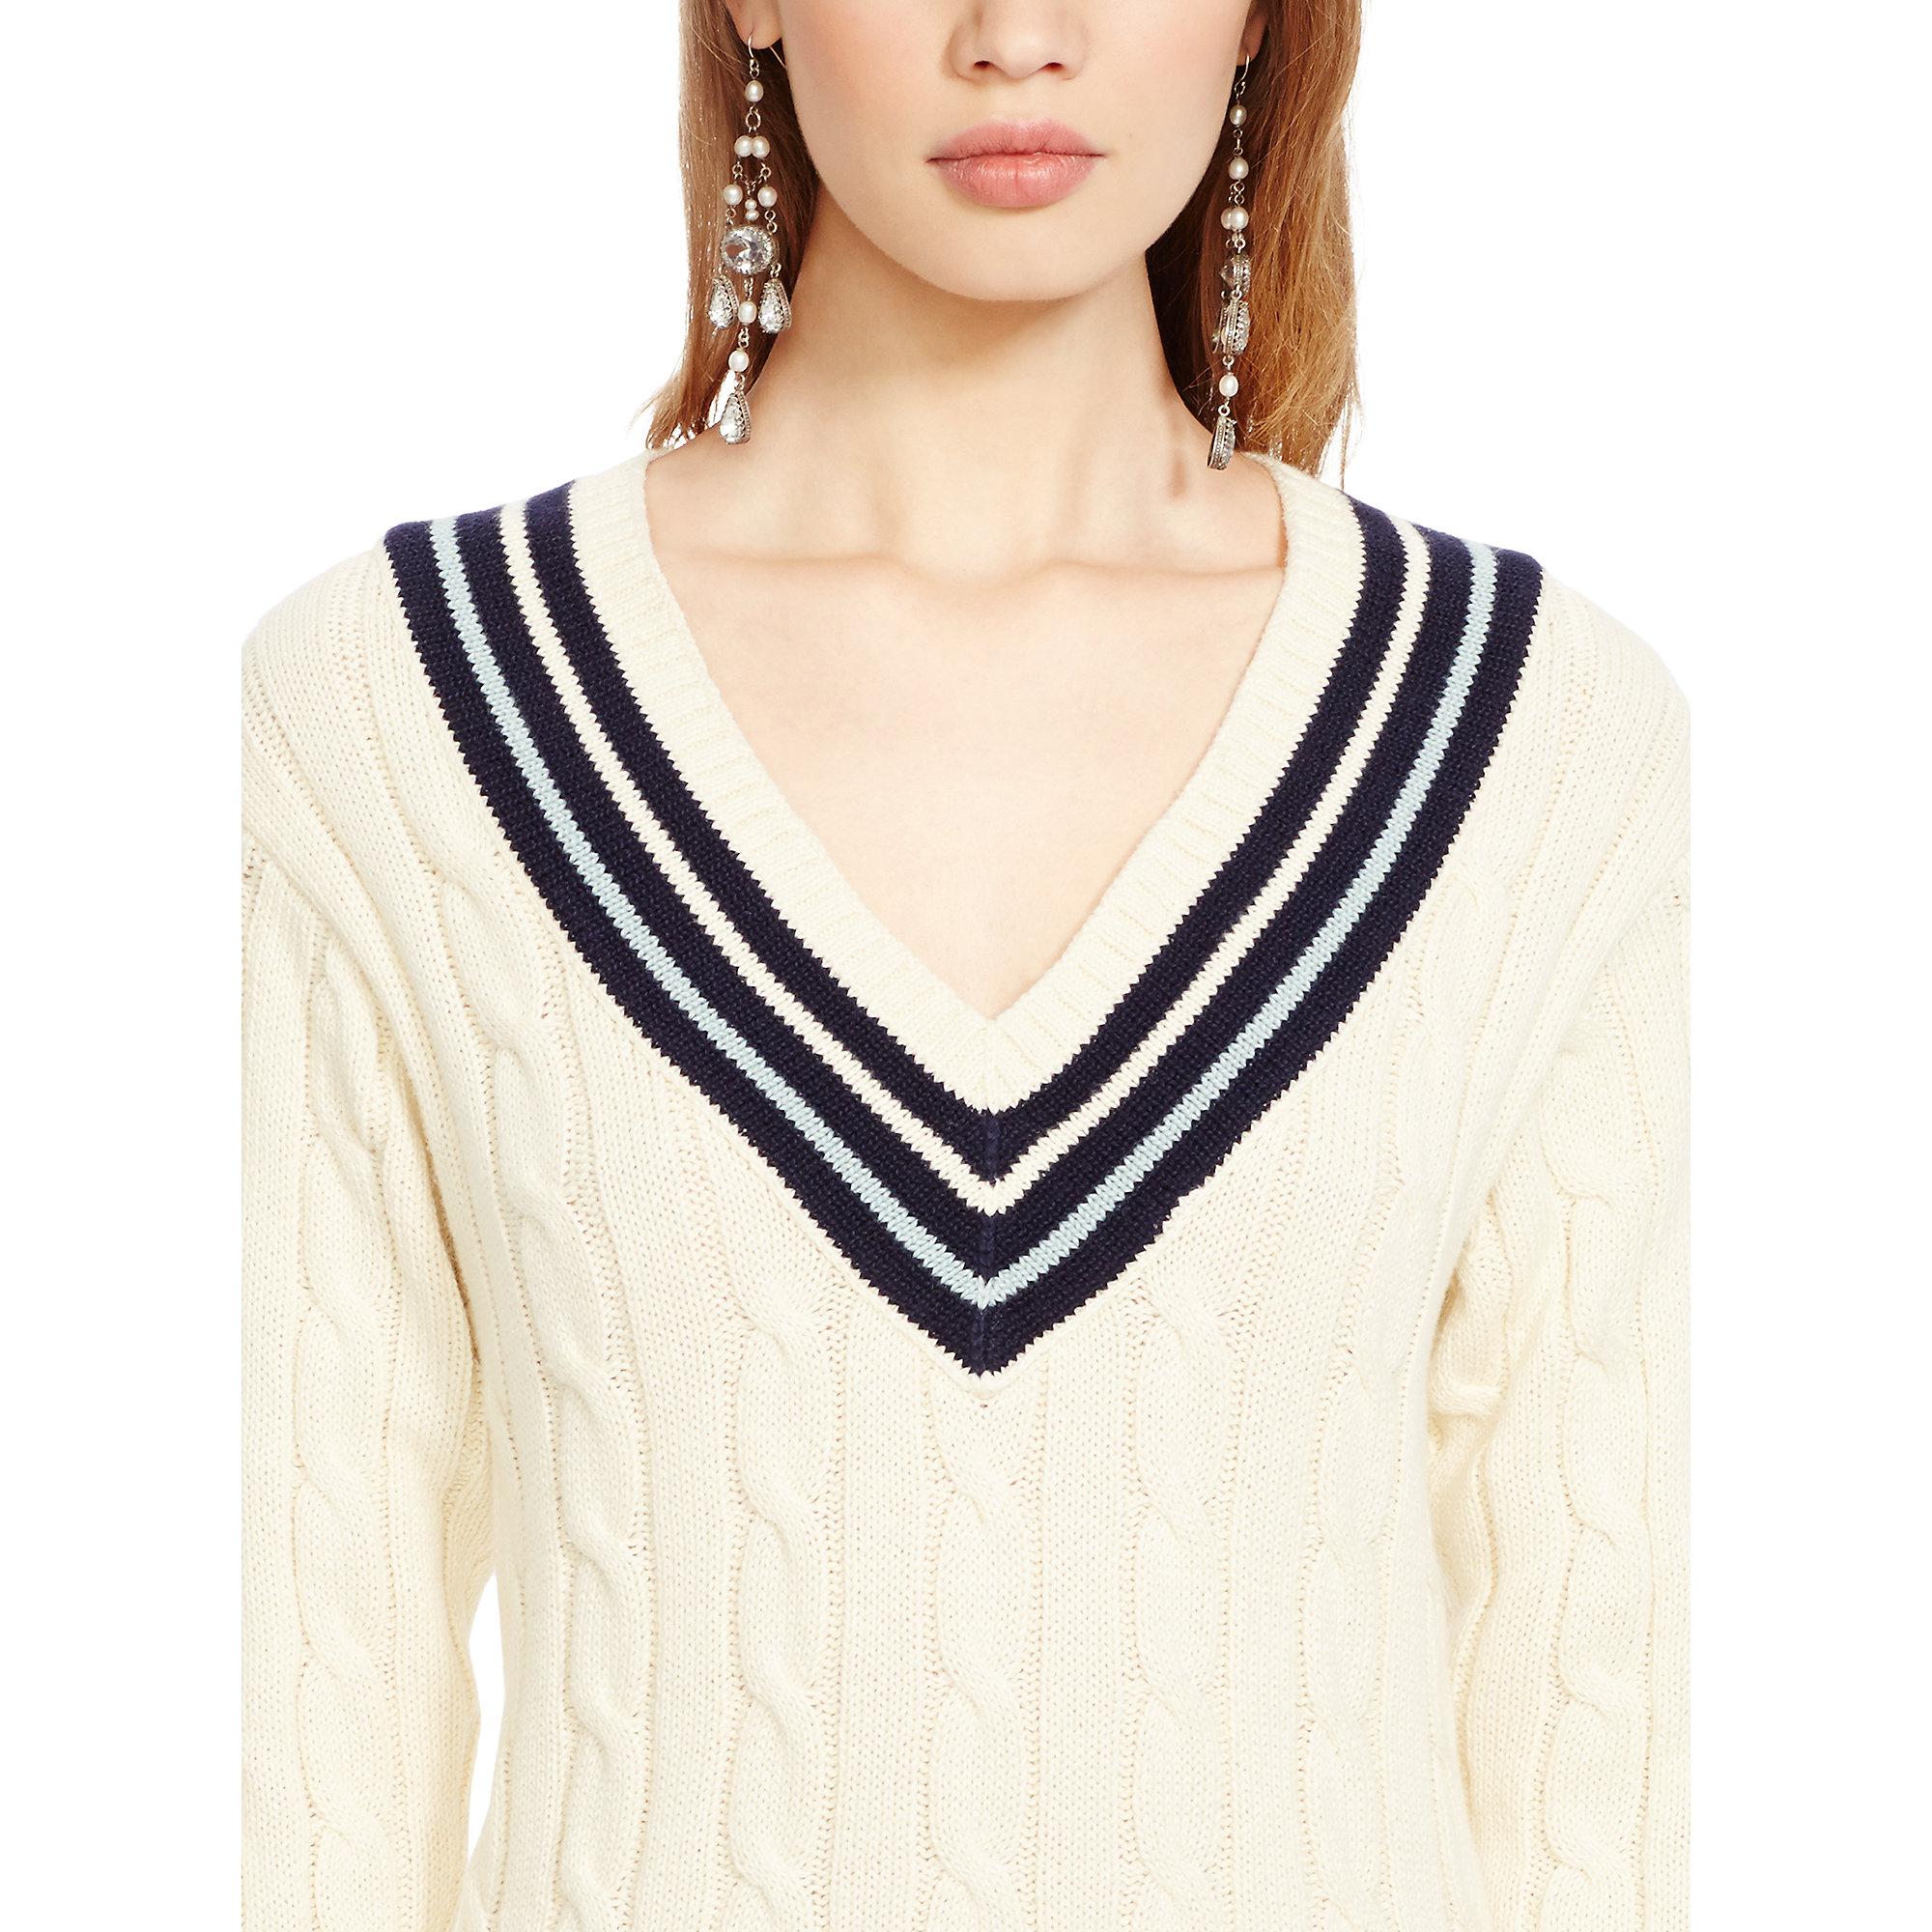 72fdea56abe3e ... purchase lyst polo ralph lauren cotton v neck cricket sweater in  natural e532e a9ed6